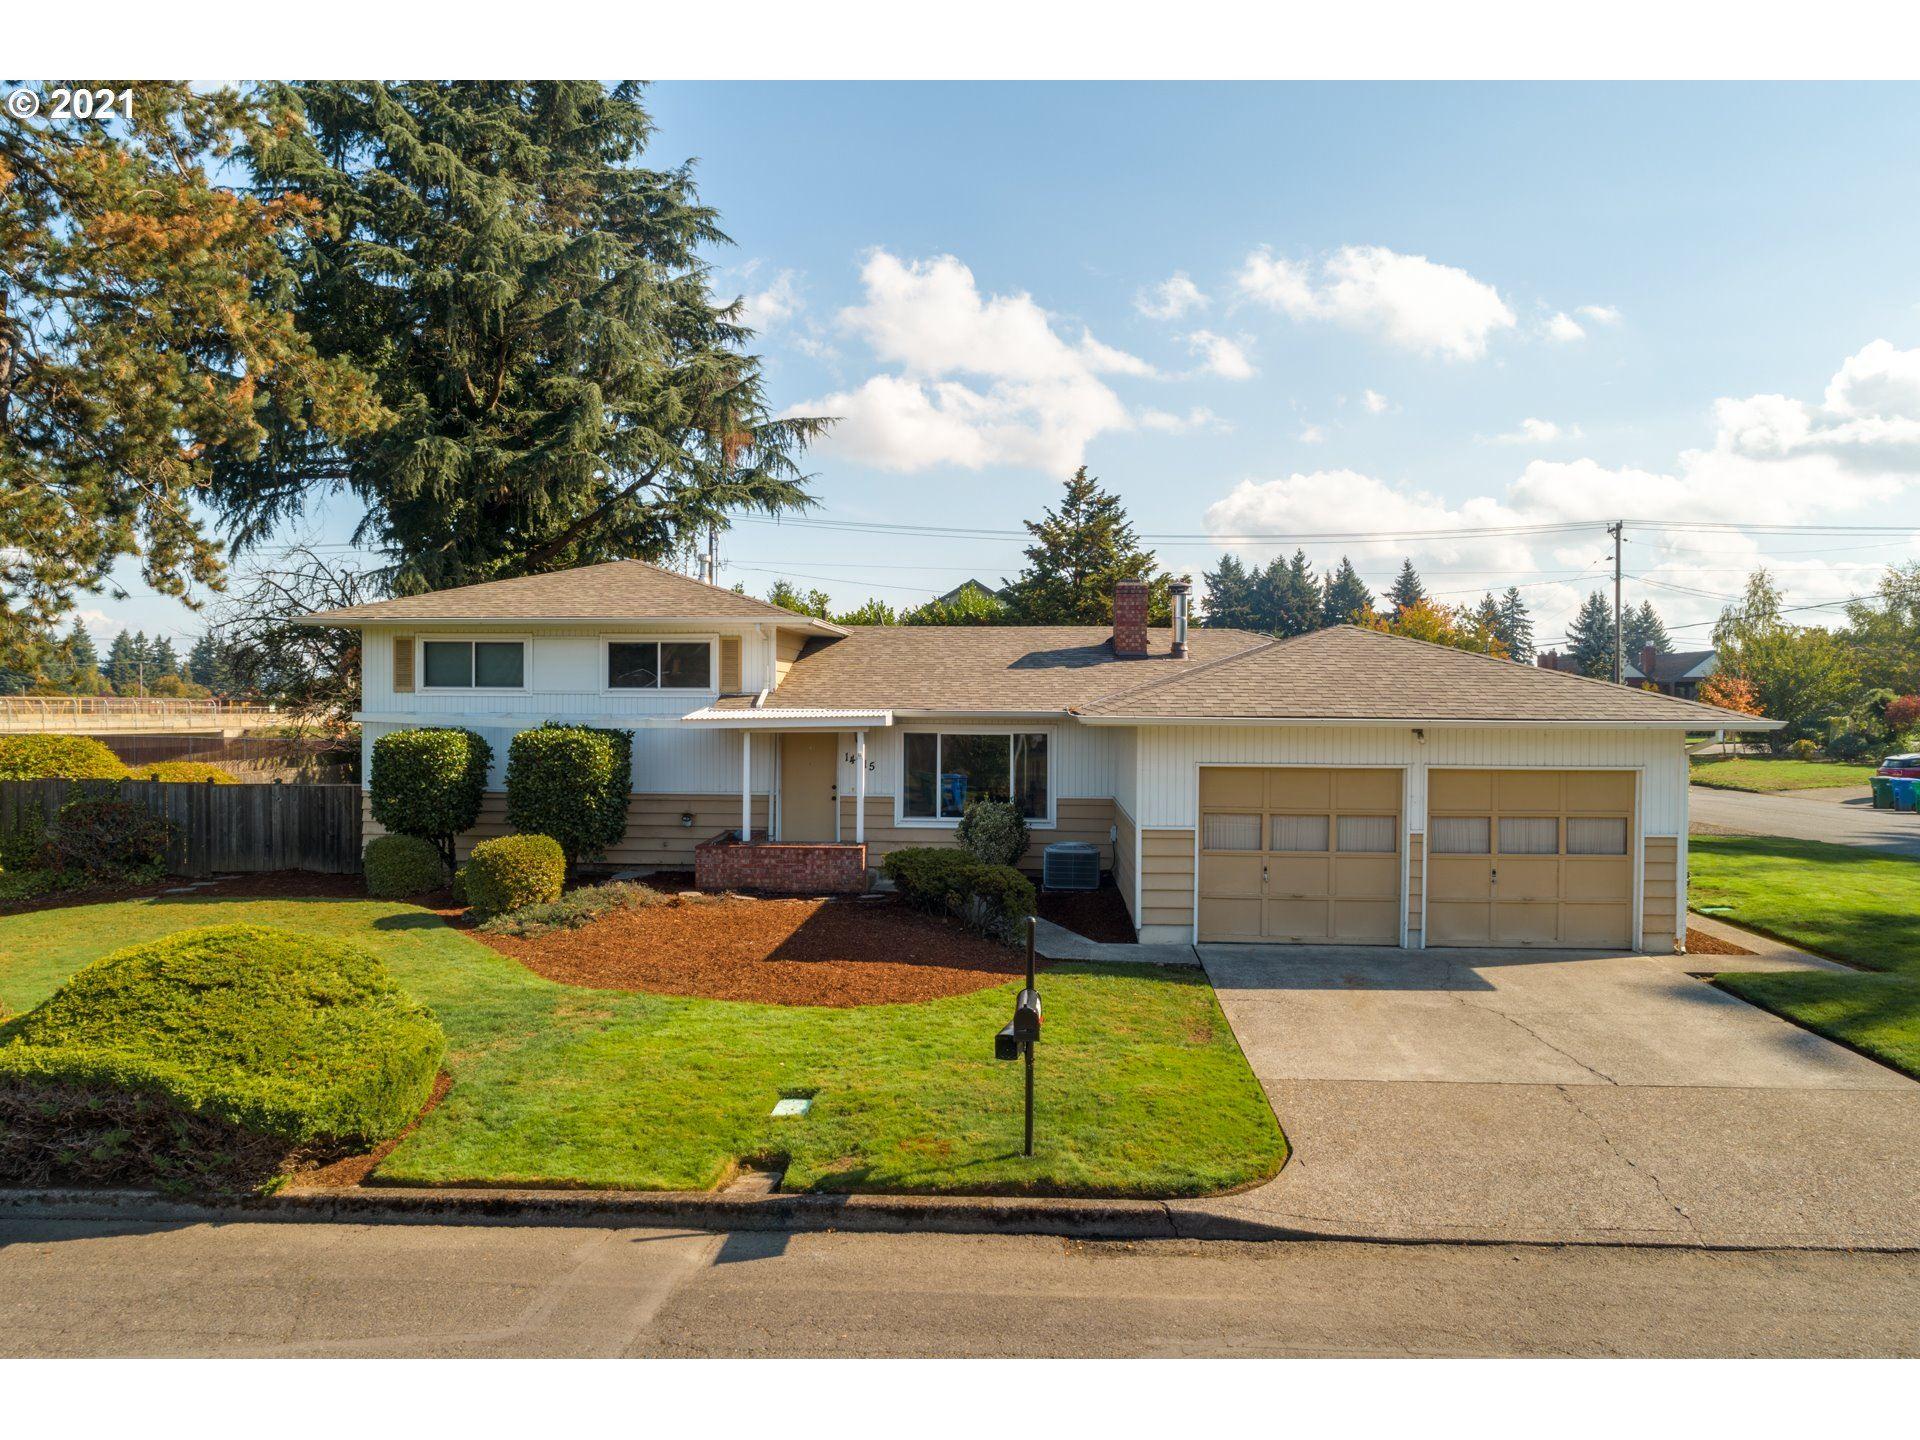 14715 NE KNOTT CT, Portland, OR 97230 - MLS#: 21399661